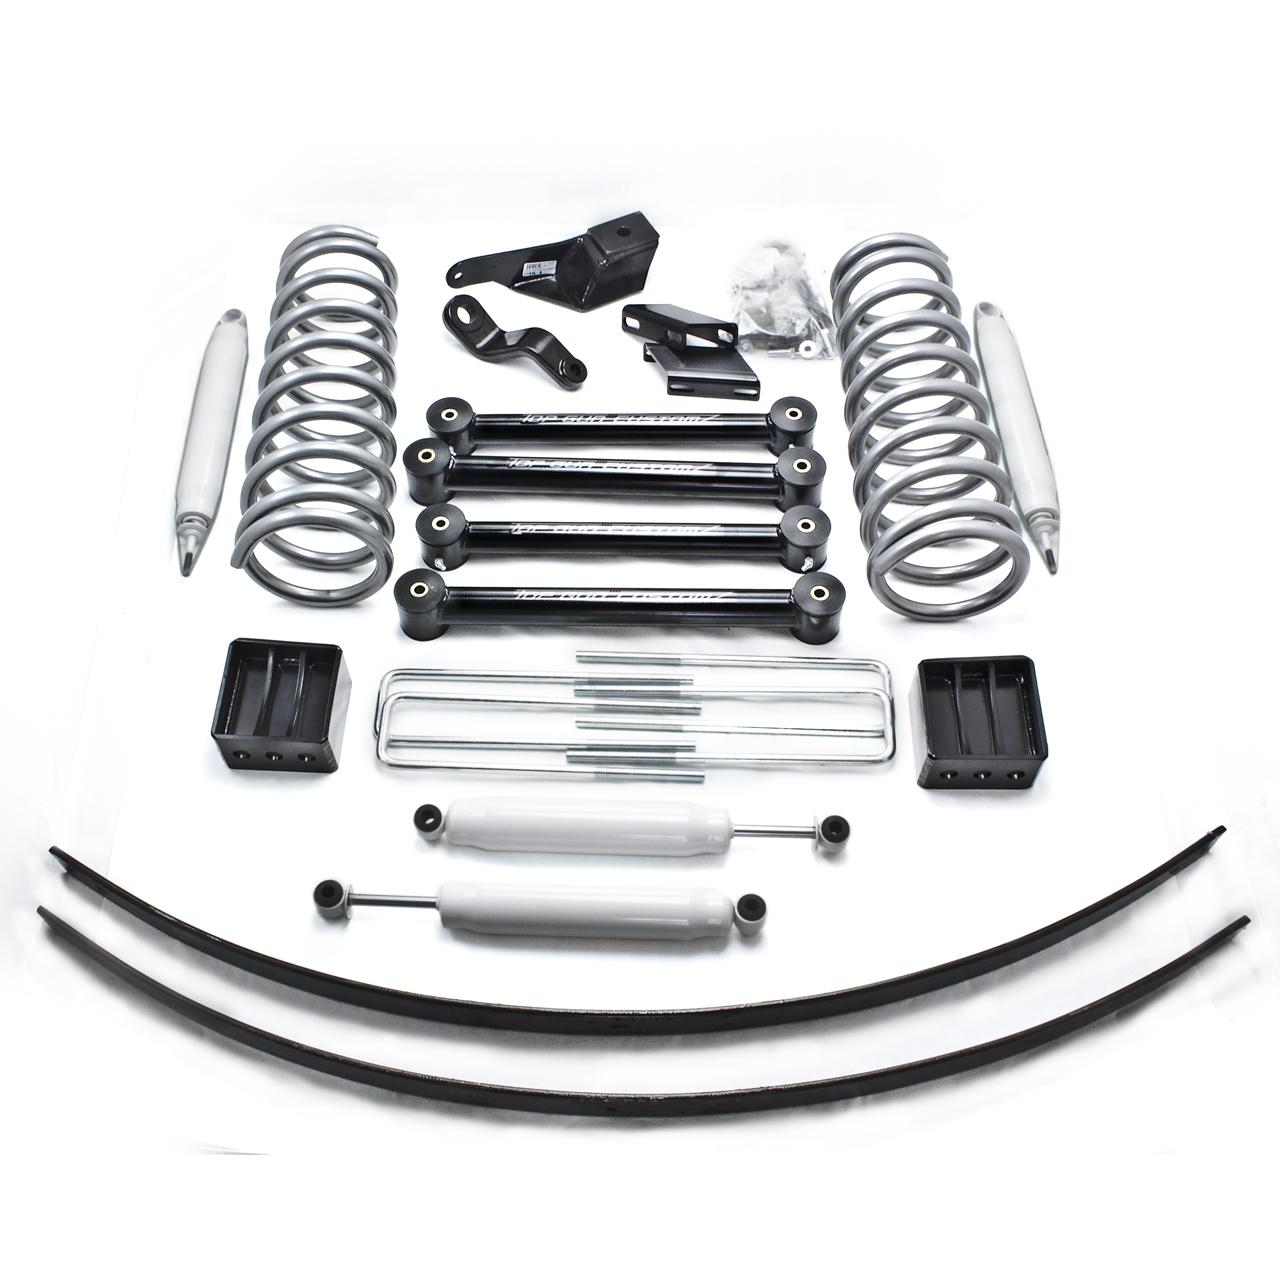 Dodge Lift Kit For 1997 Dodge Ram 3500 Truck Lift Kits